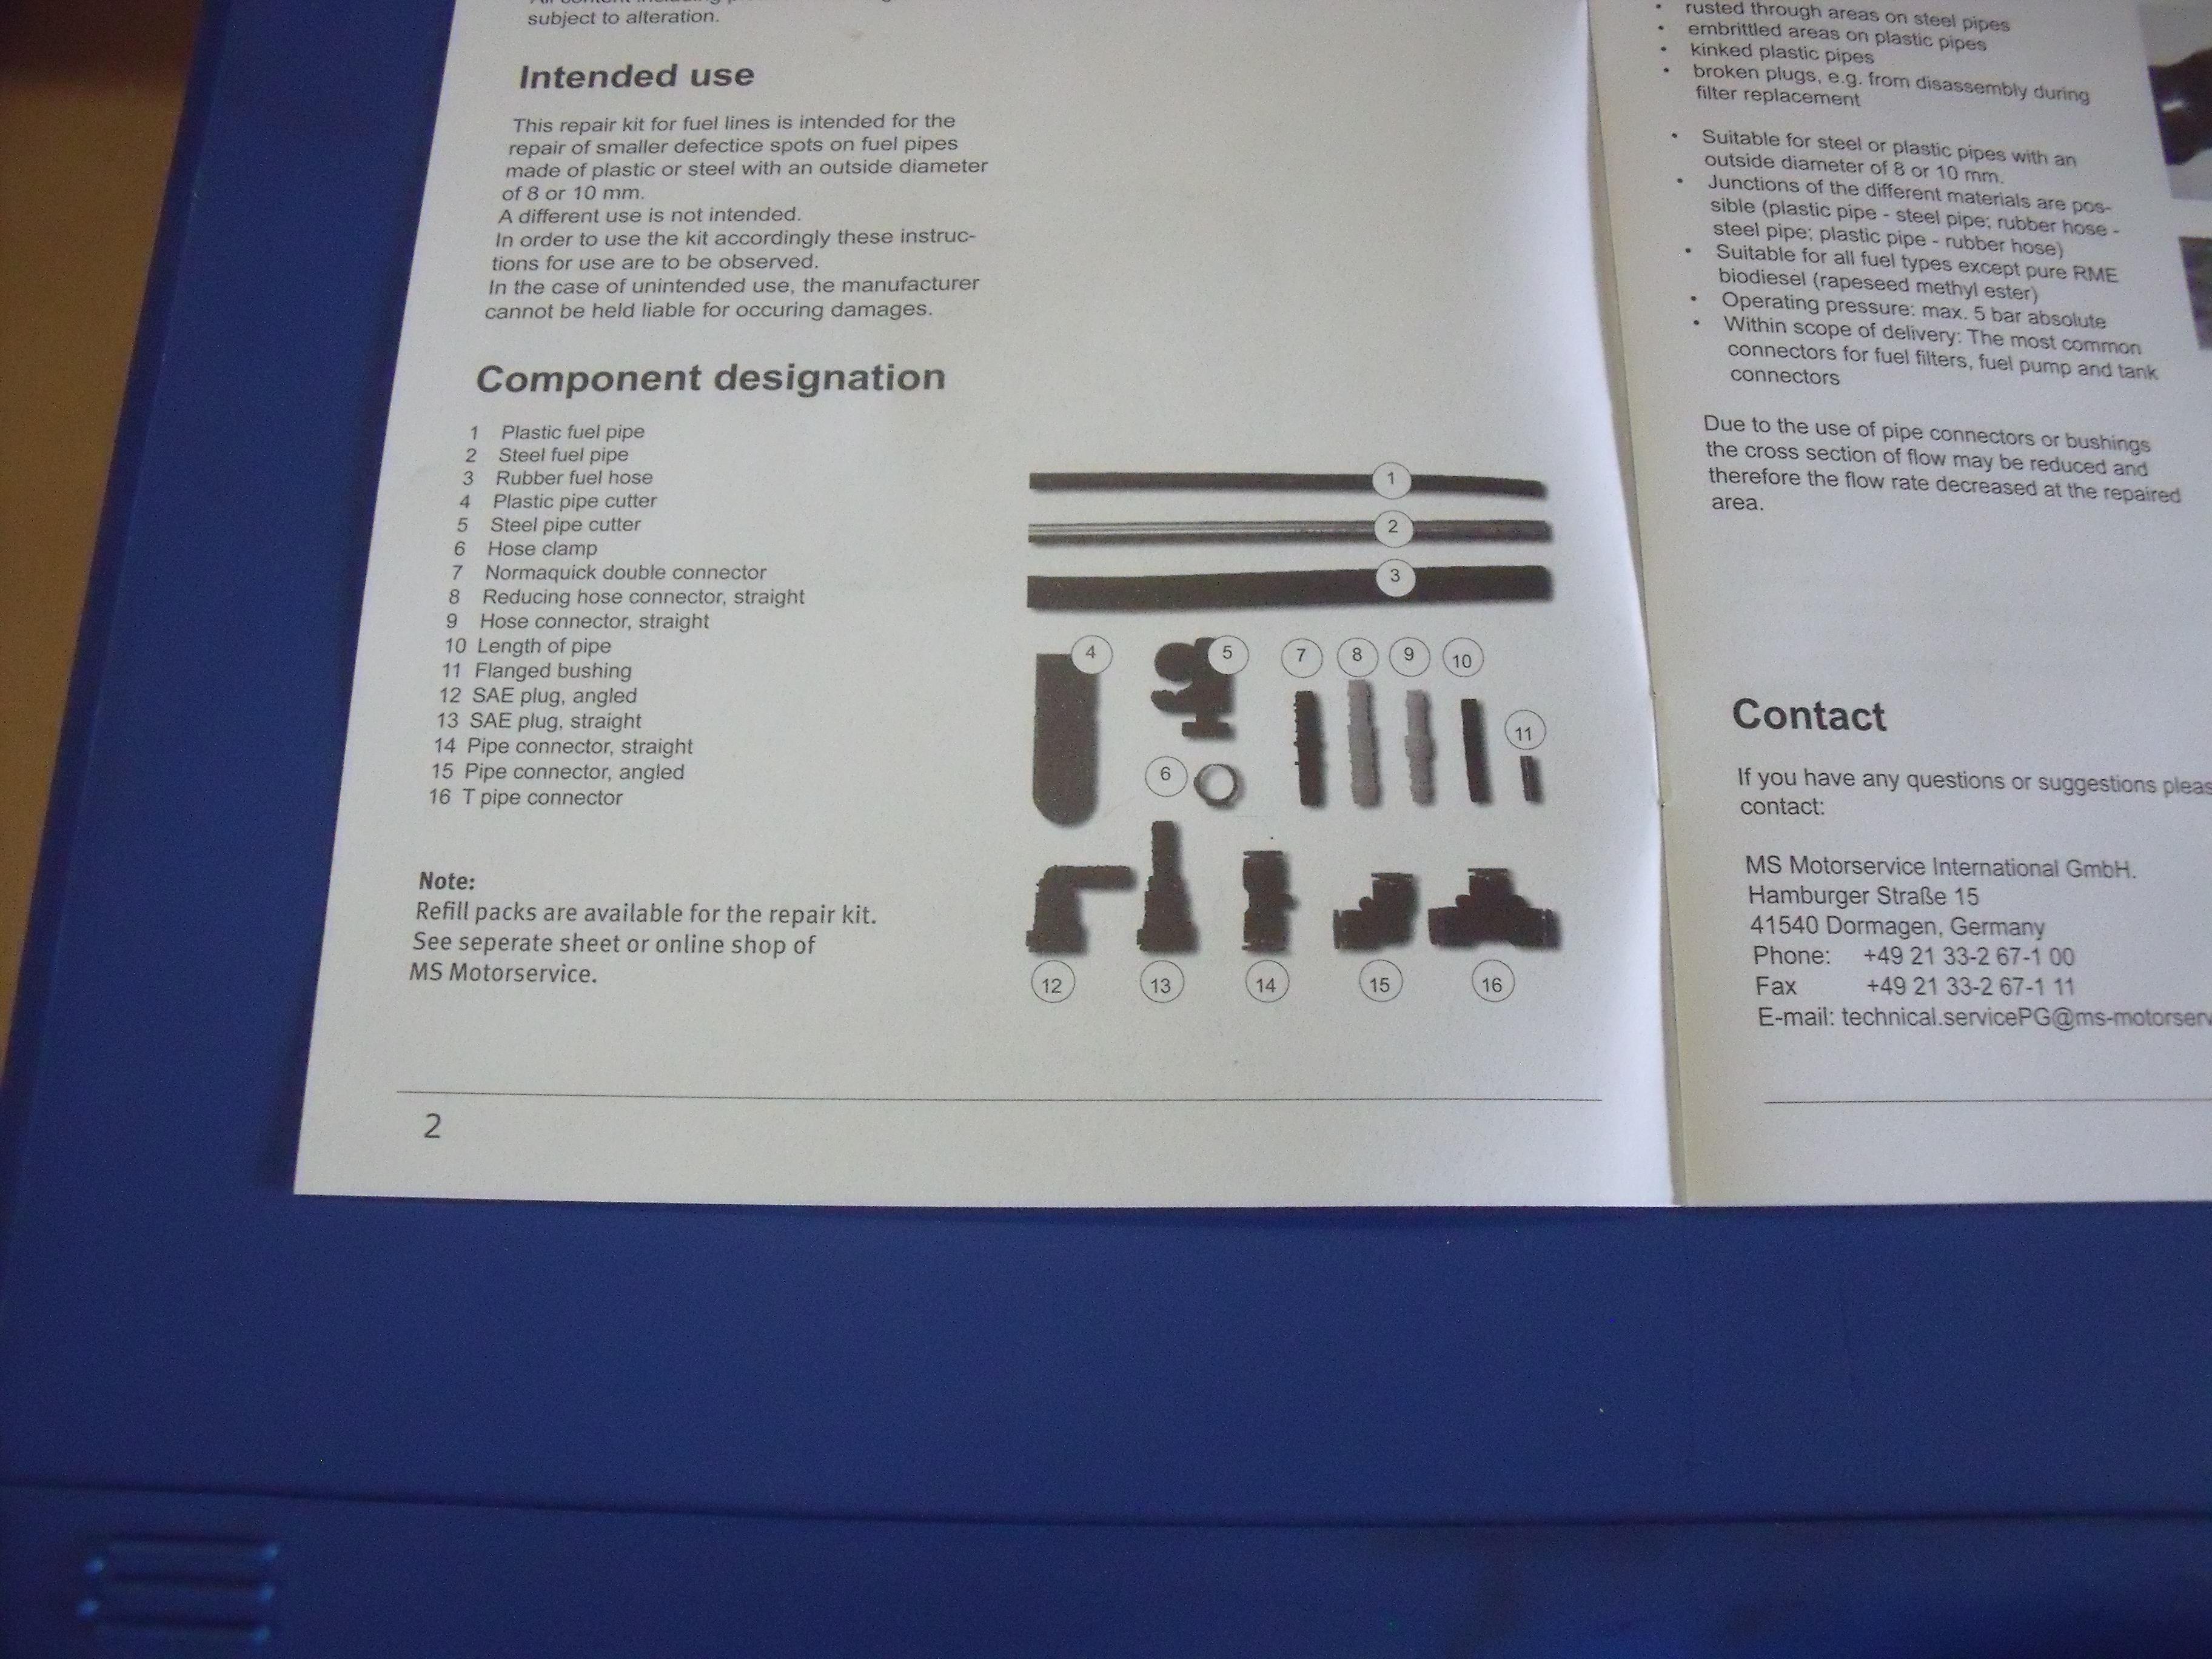 New Pierburg fuel line repair kit - AW Shop